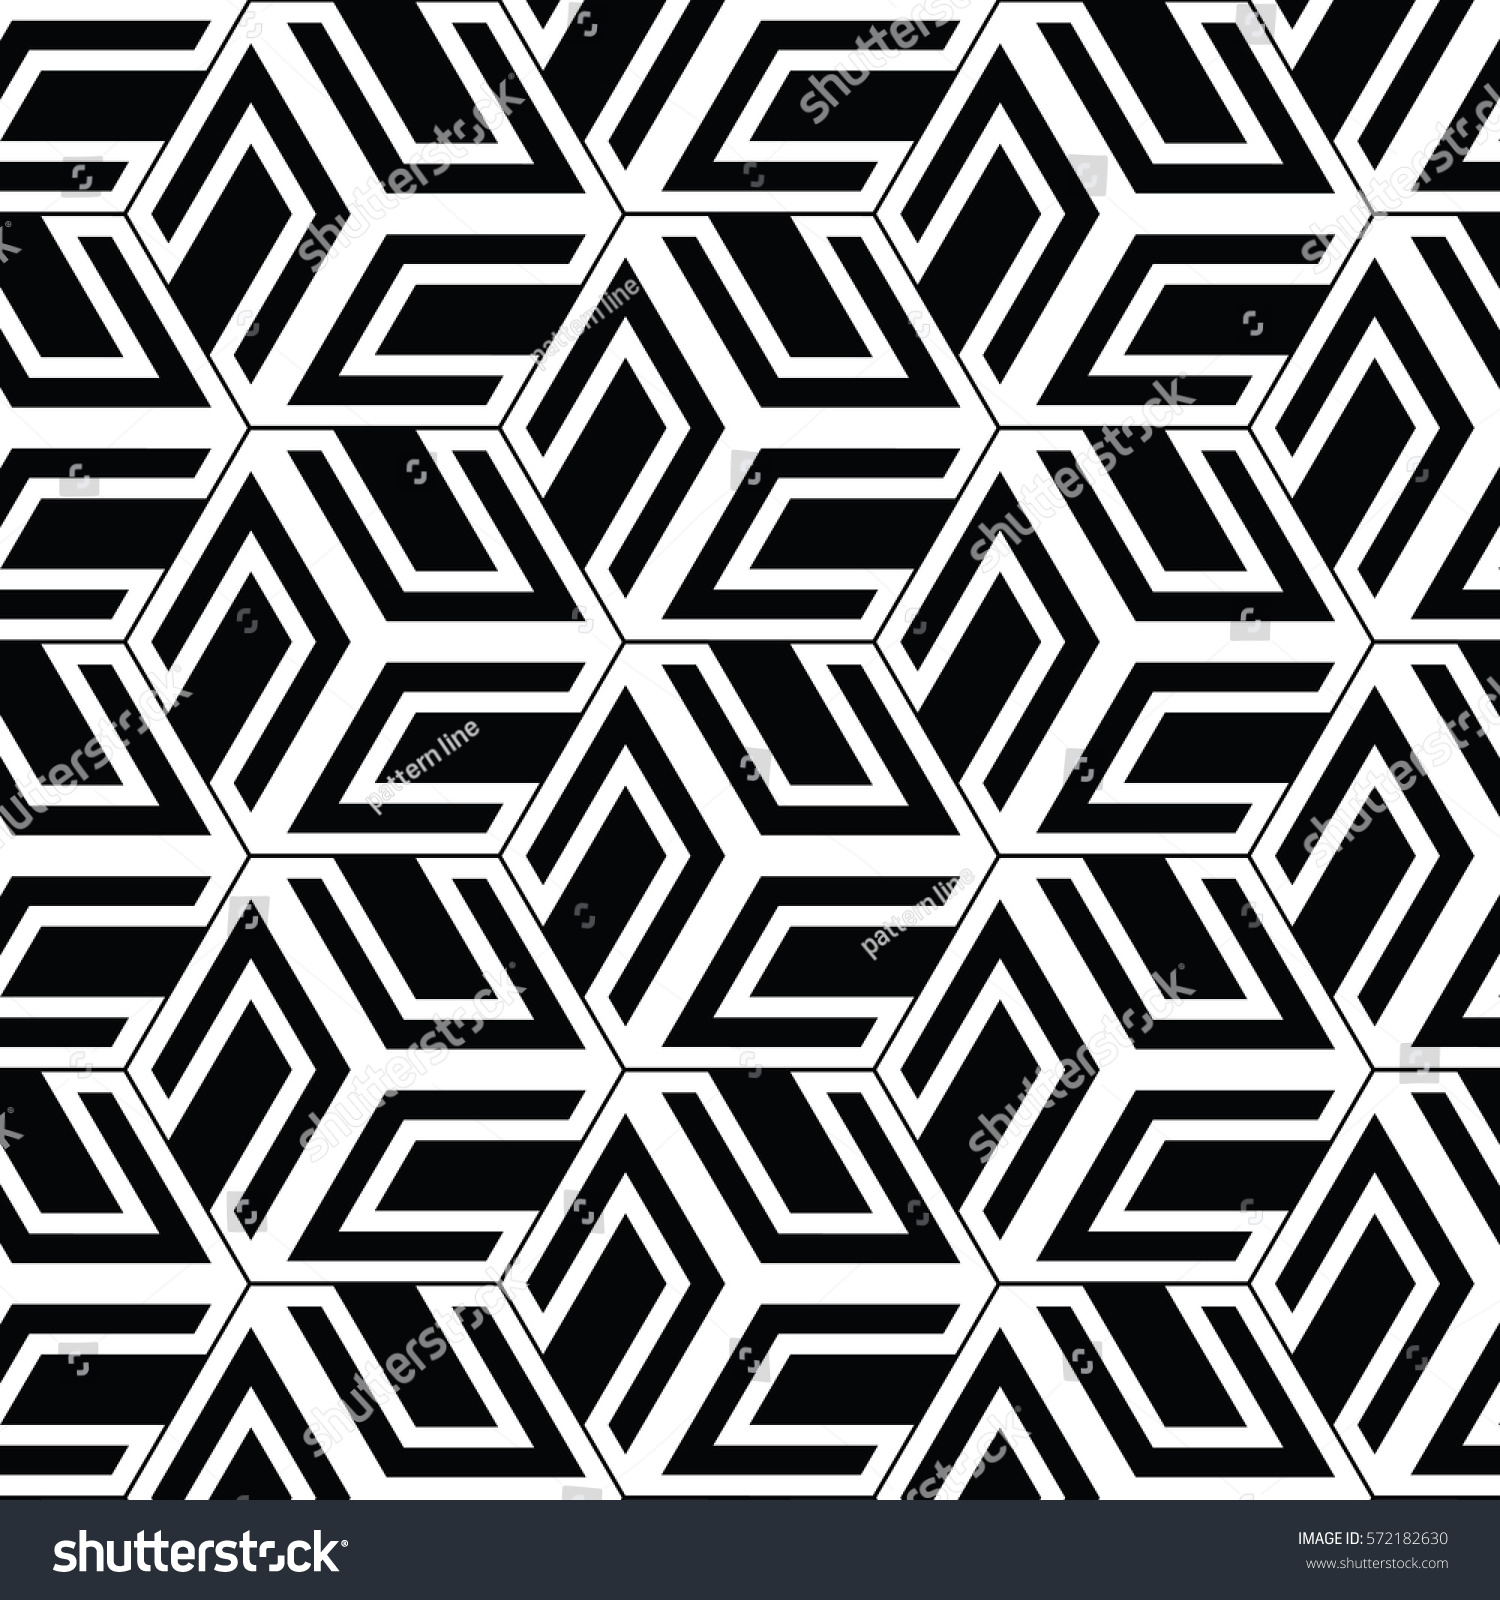 Line Texture Vector : Black white patternbackground line geometricmodern stylish